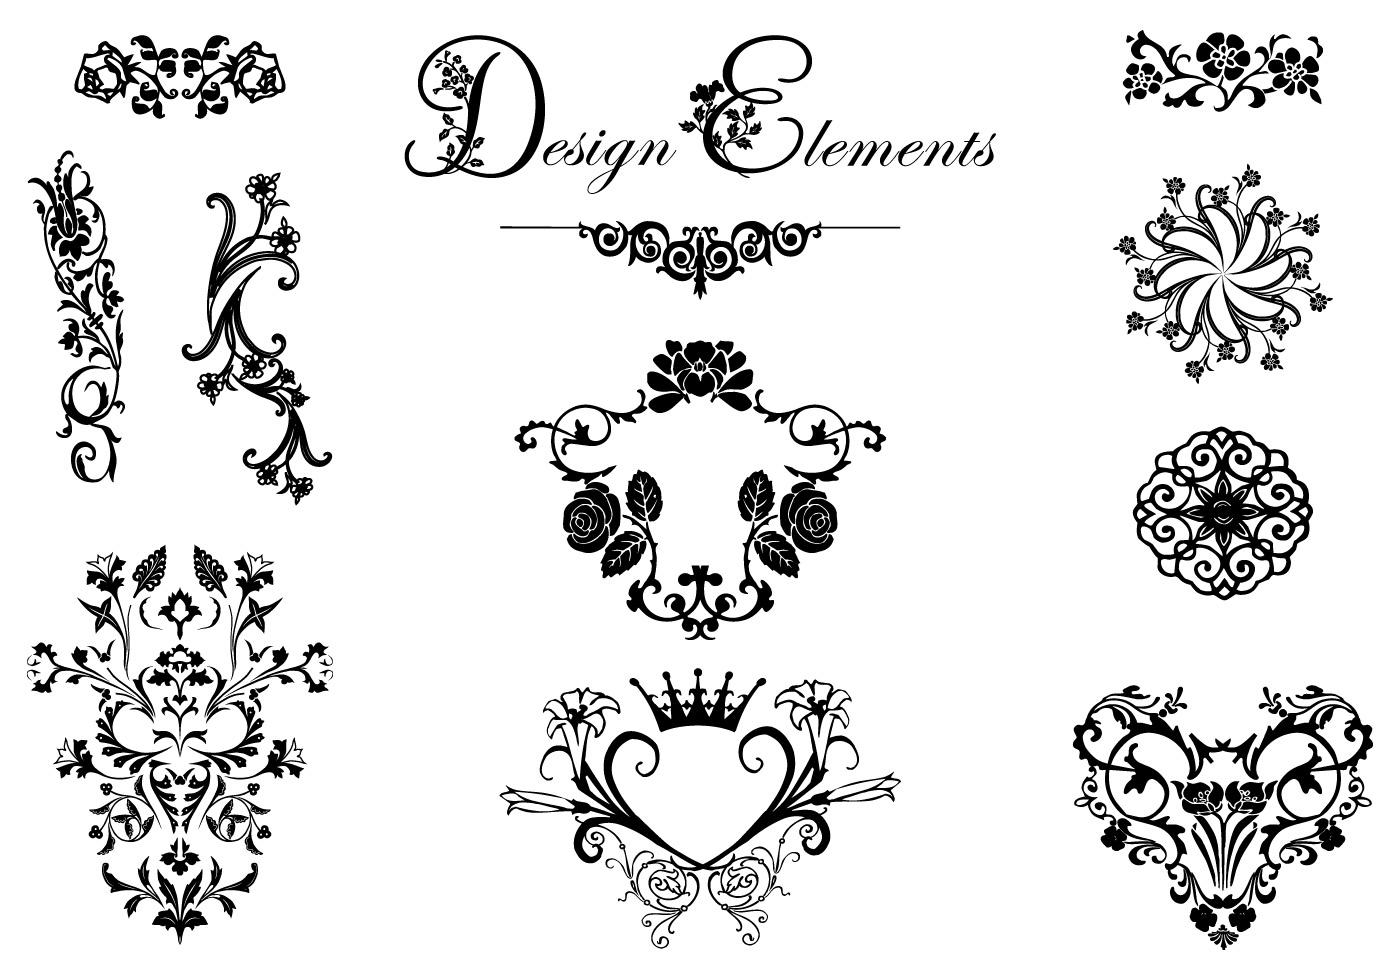 Floral Ornament Vector Free: Floral Design Ornament Vector Pack